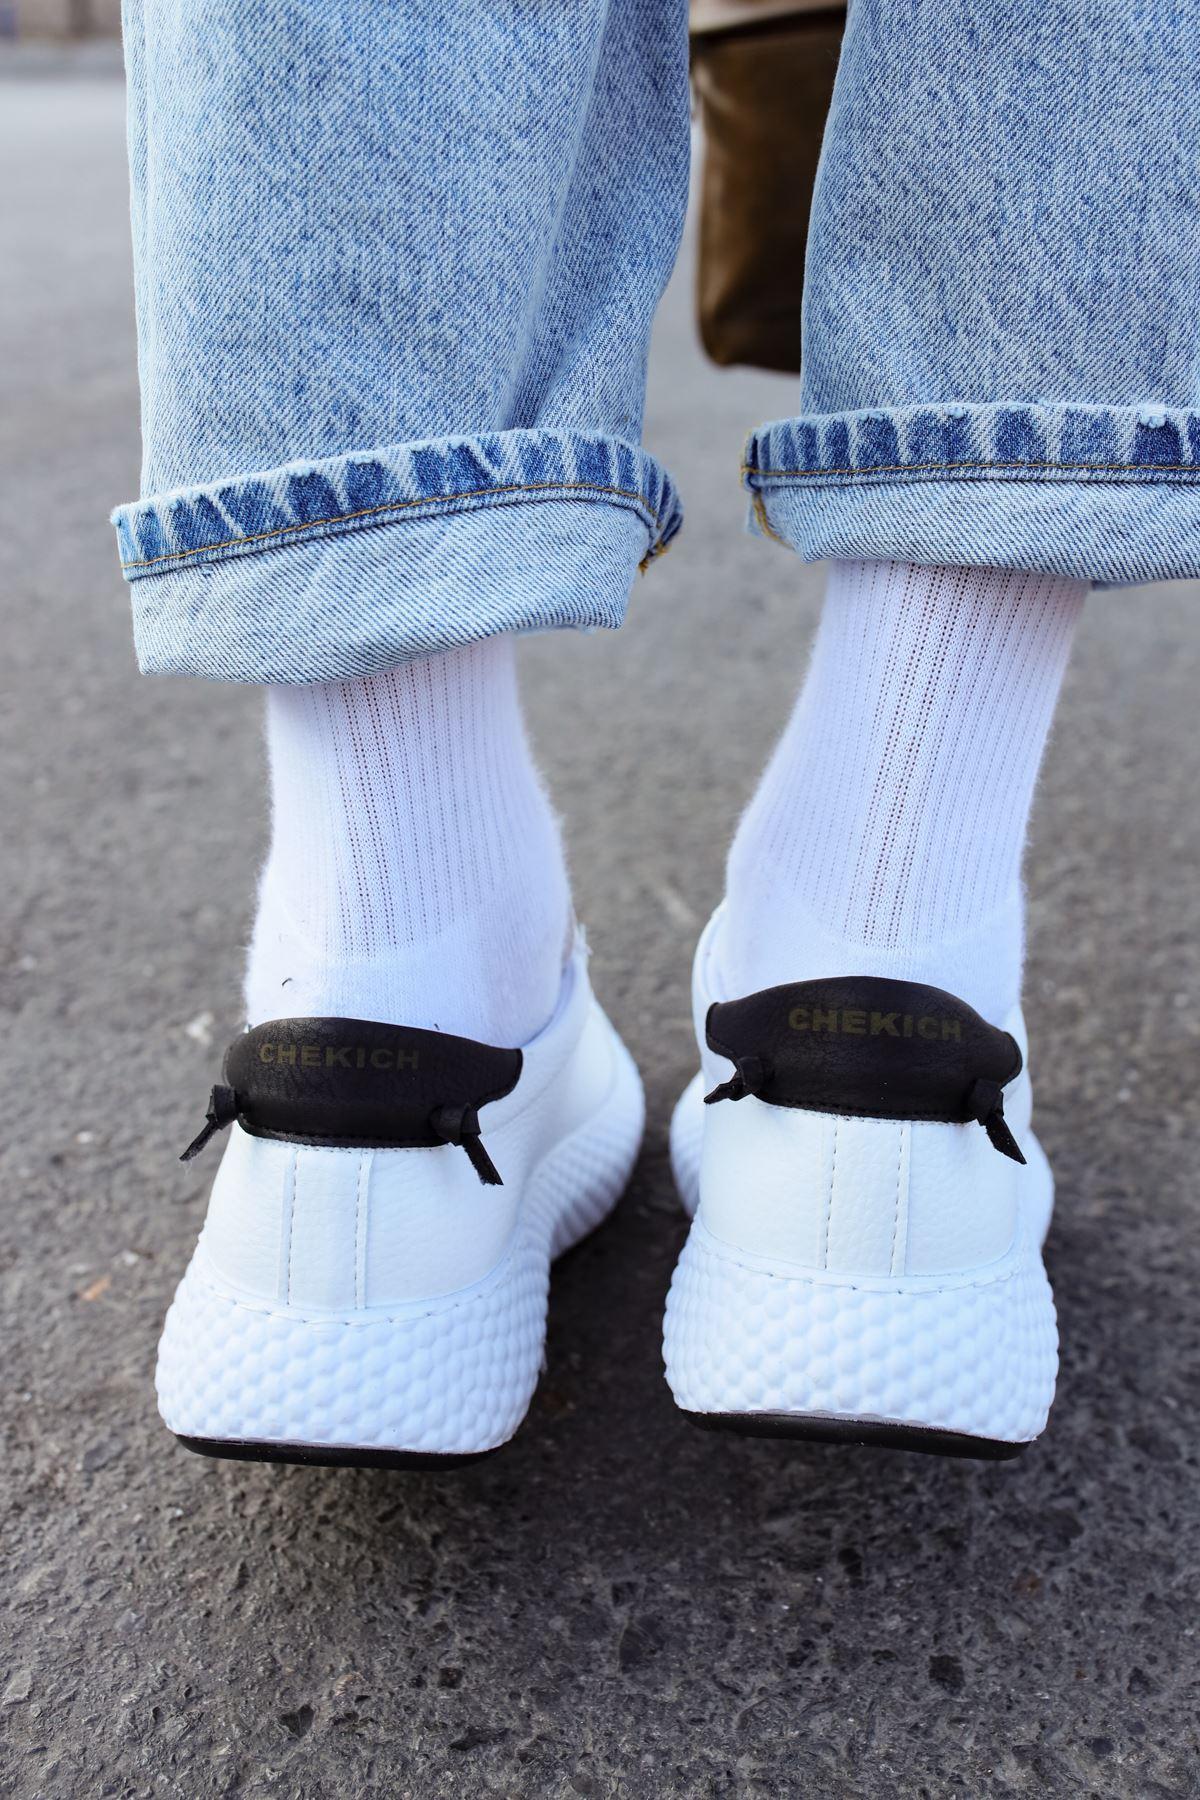 Chekich CH107 GBT Erkek Ayakkabı BEYAZ/SİYAH